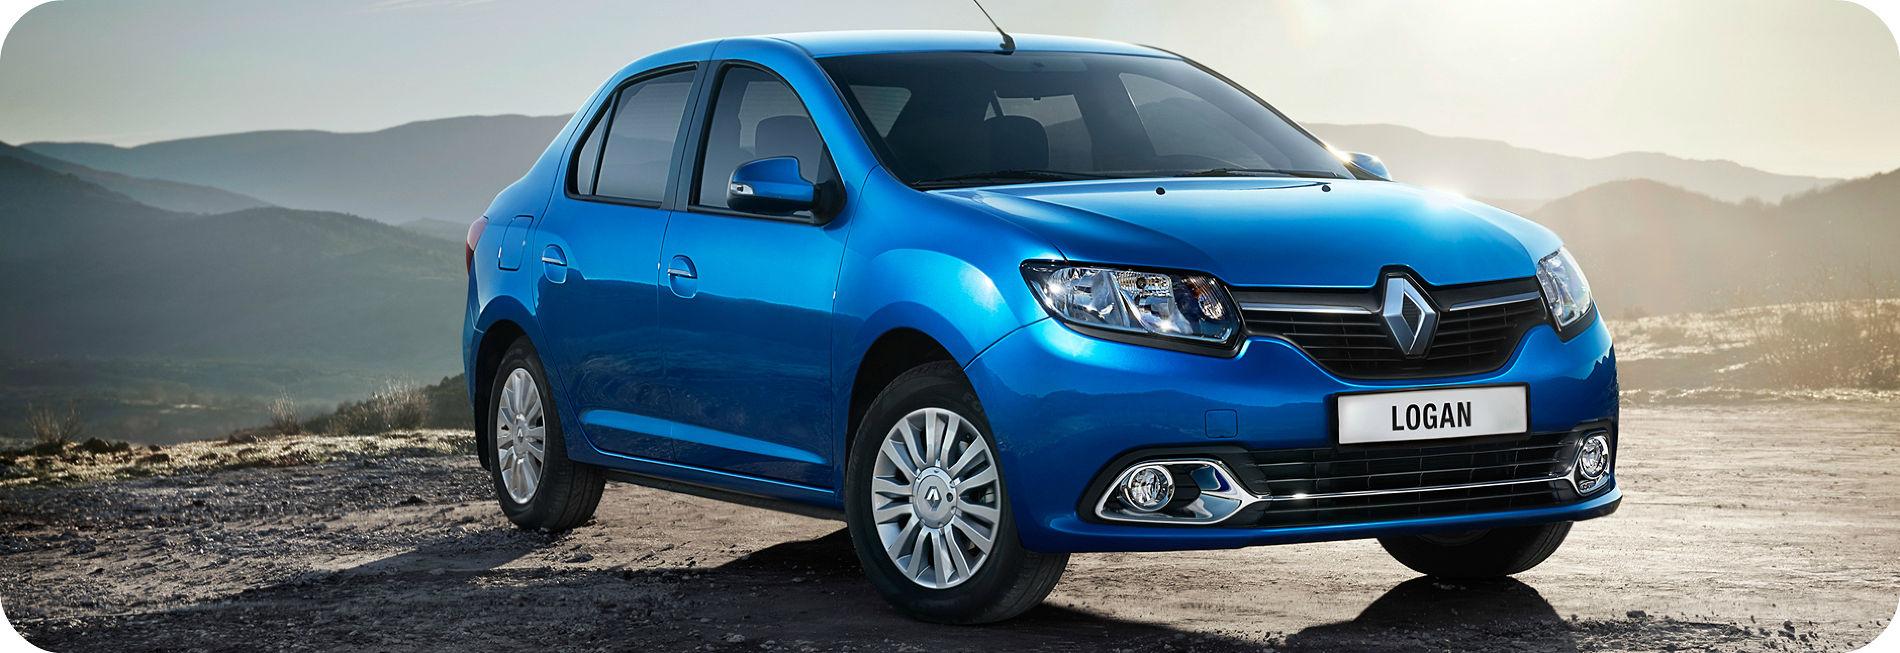 Renault Logan ©Фото Юга.ру